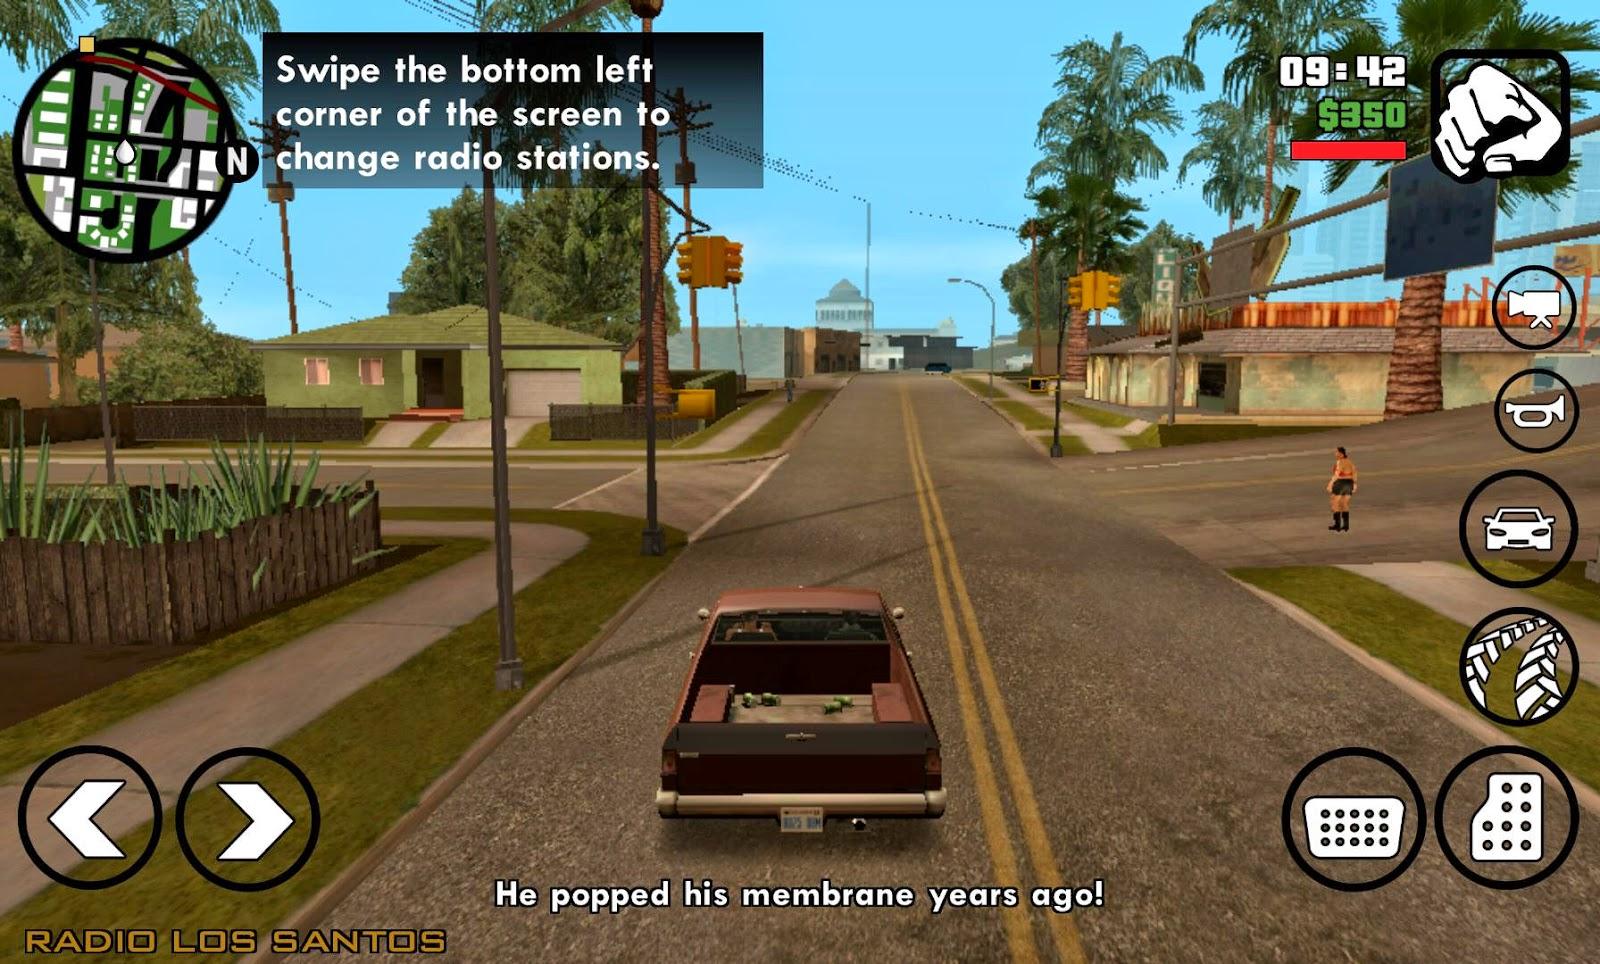 Download Apk Game Grand Theft Auto (GTA) San Andreas versi Android dan iOS